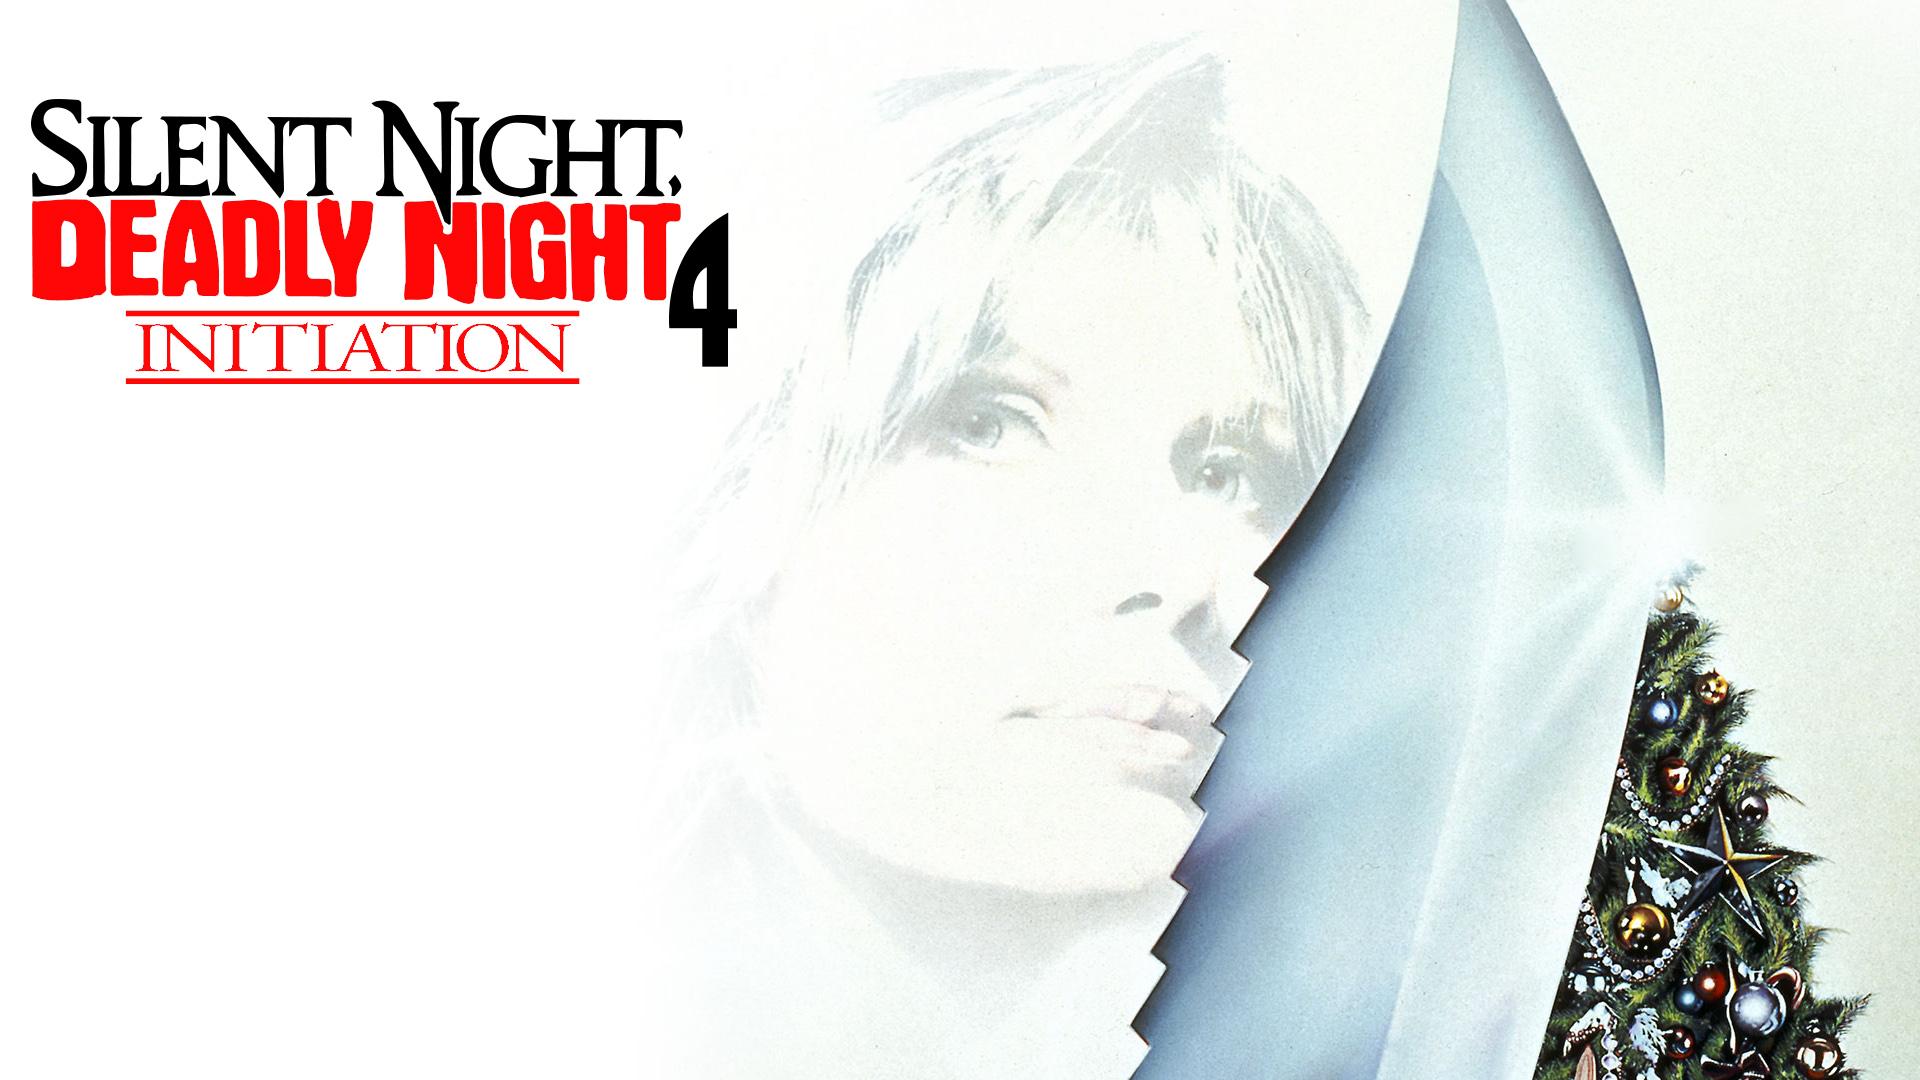 Silent Night, Deadly Night 4: Initation